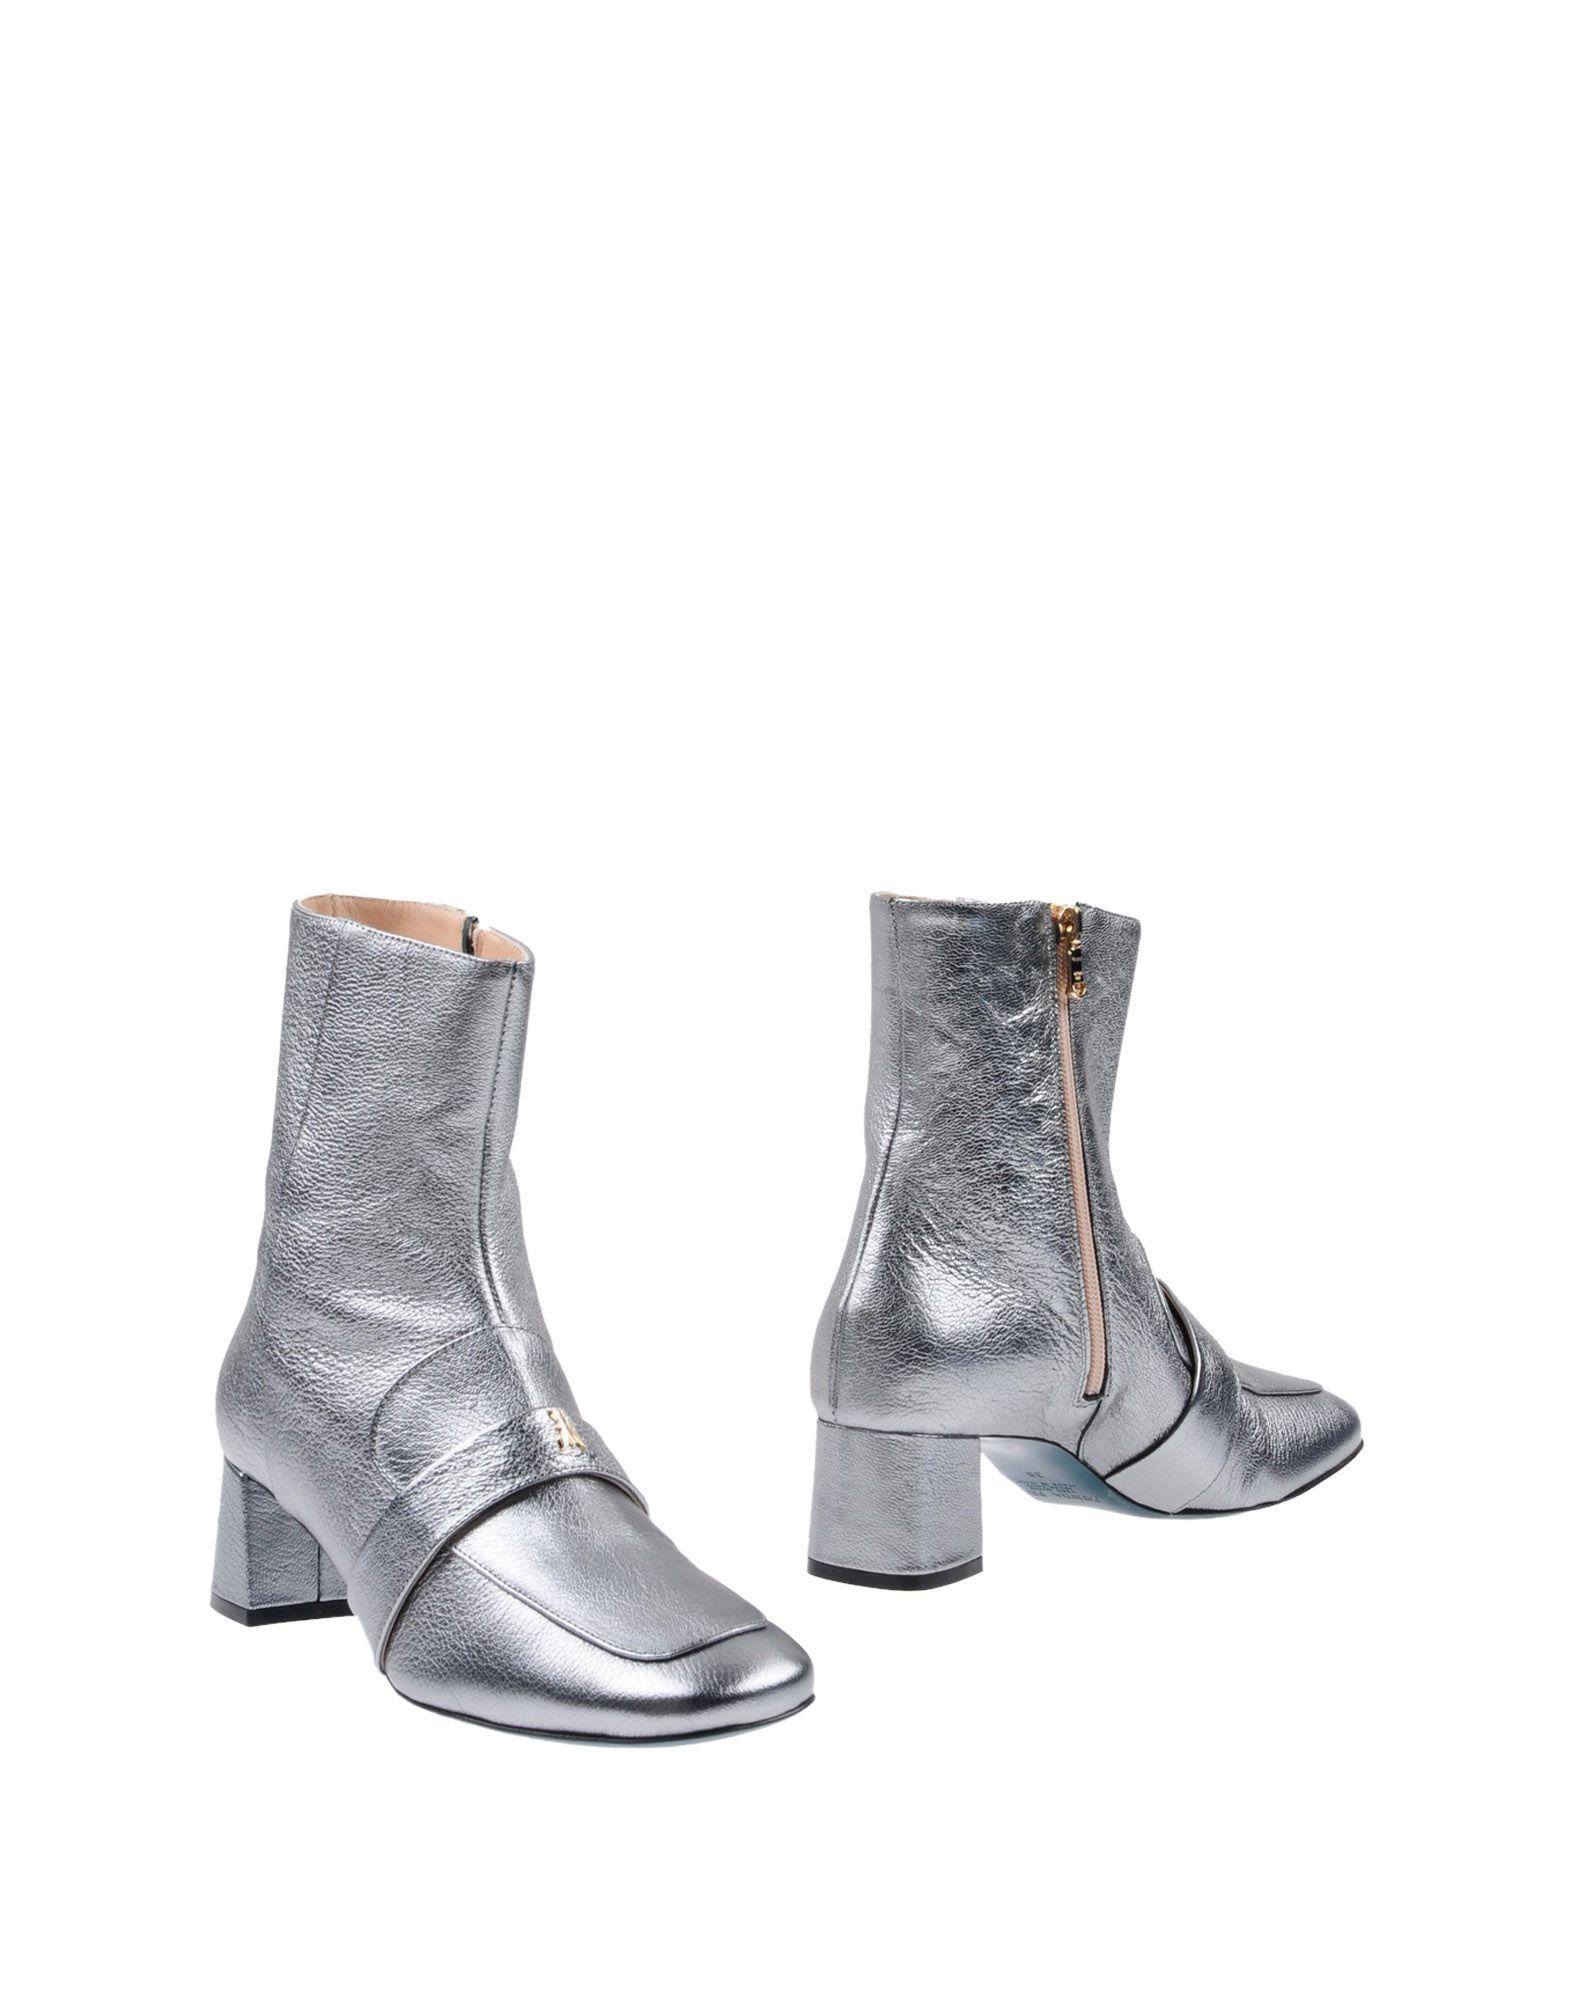 Patrizia Patrizia Patrizia Pepe Stiefelette Damen  11433052UA Gute Qualität beliebte Schuhe 17536a